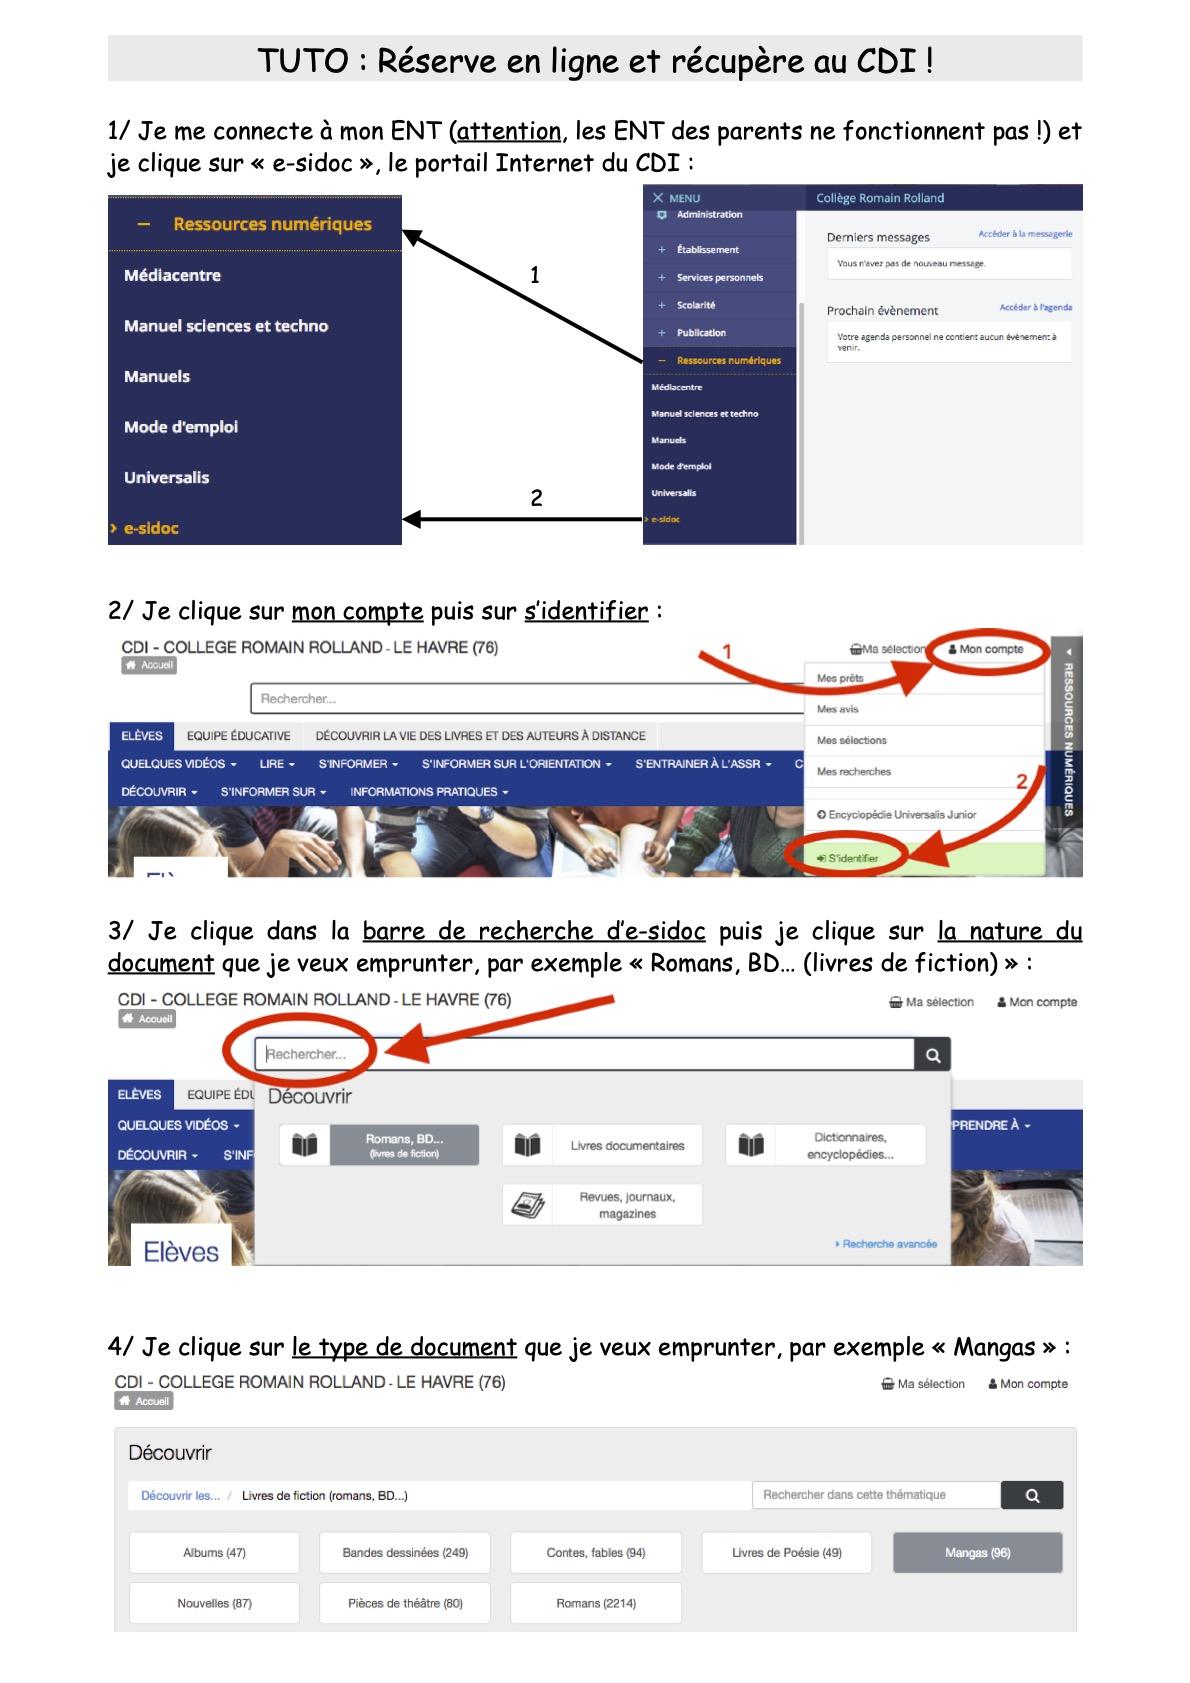 Tuto Clique & Collecte page 1/2